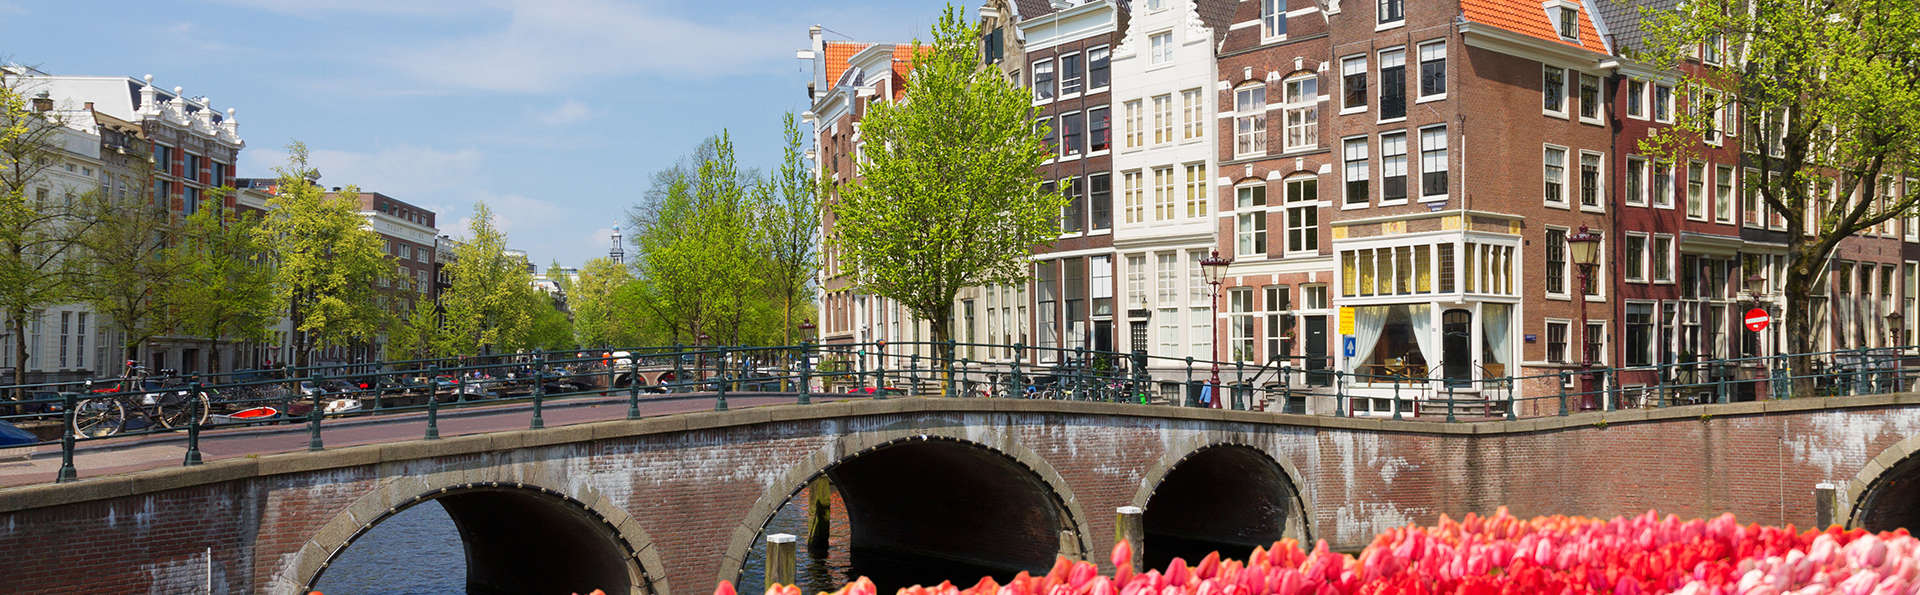 Descubre el centro de Ámsterdam en bicicleta